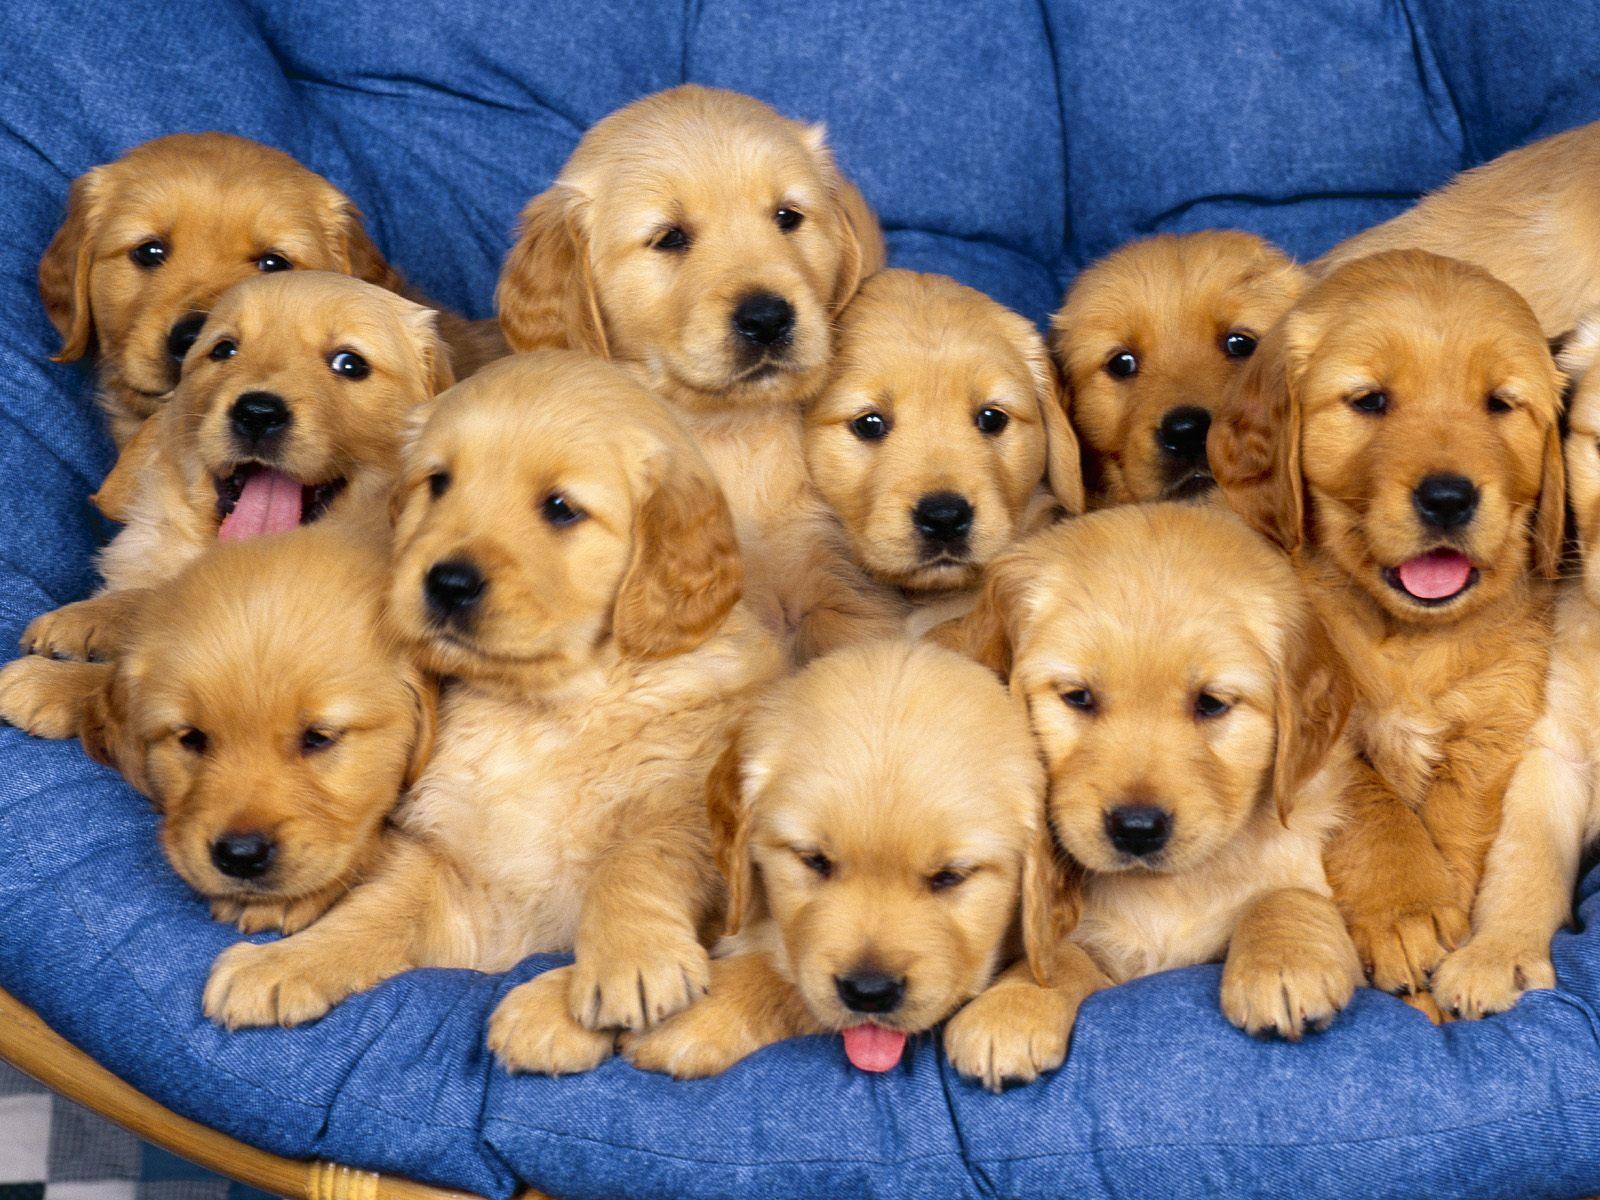 dog image cute puppies wallpapers dog hd wallpaper dog hd desktop 1600x1200